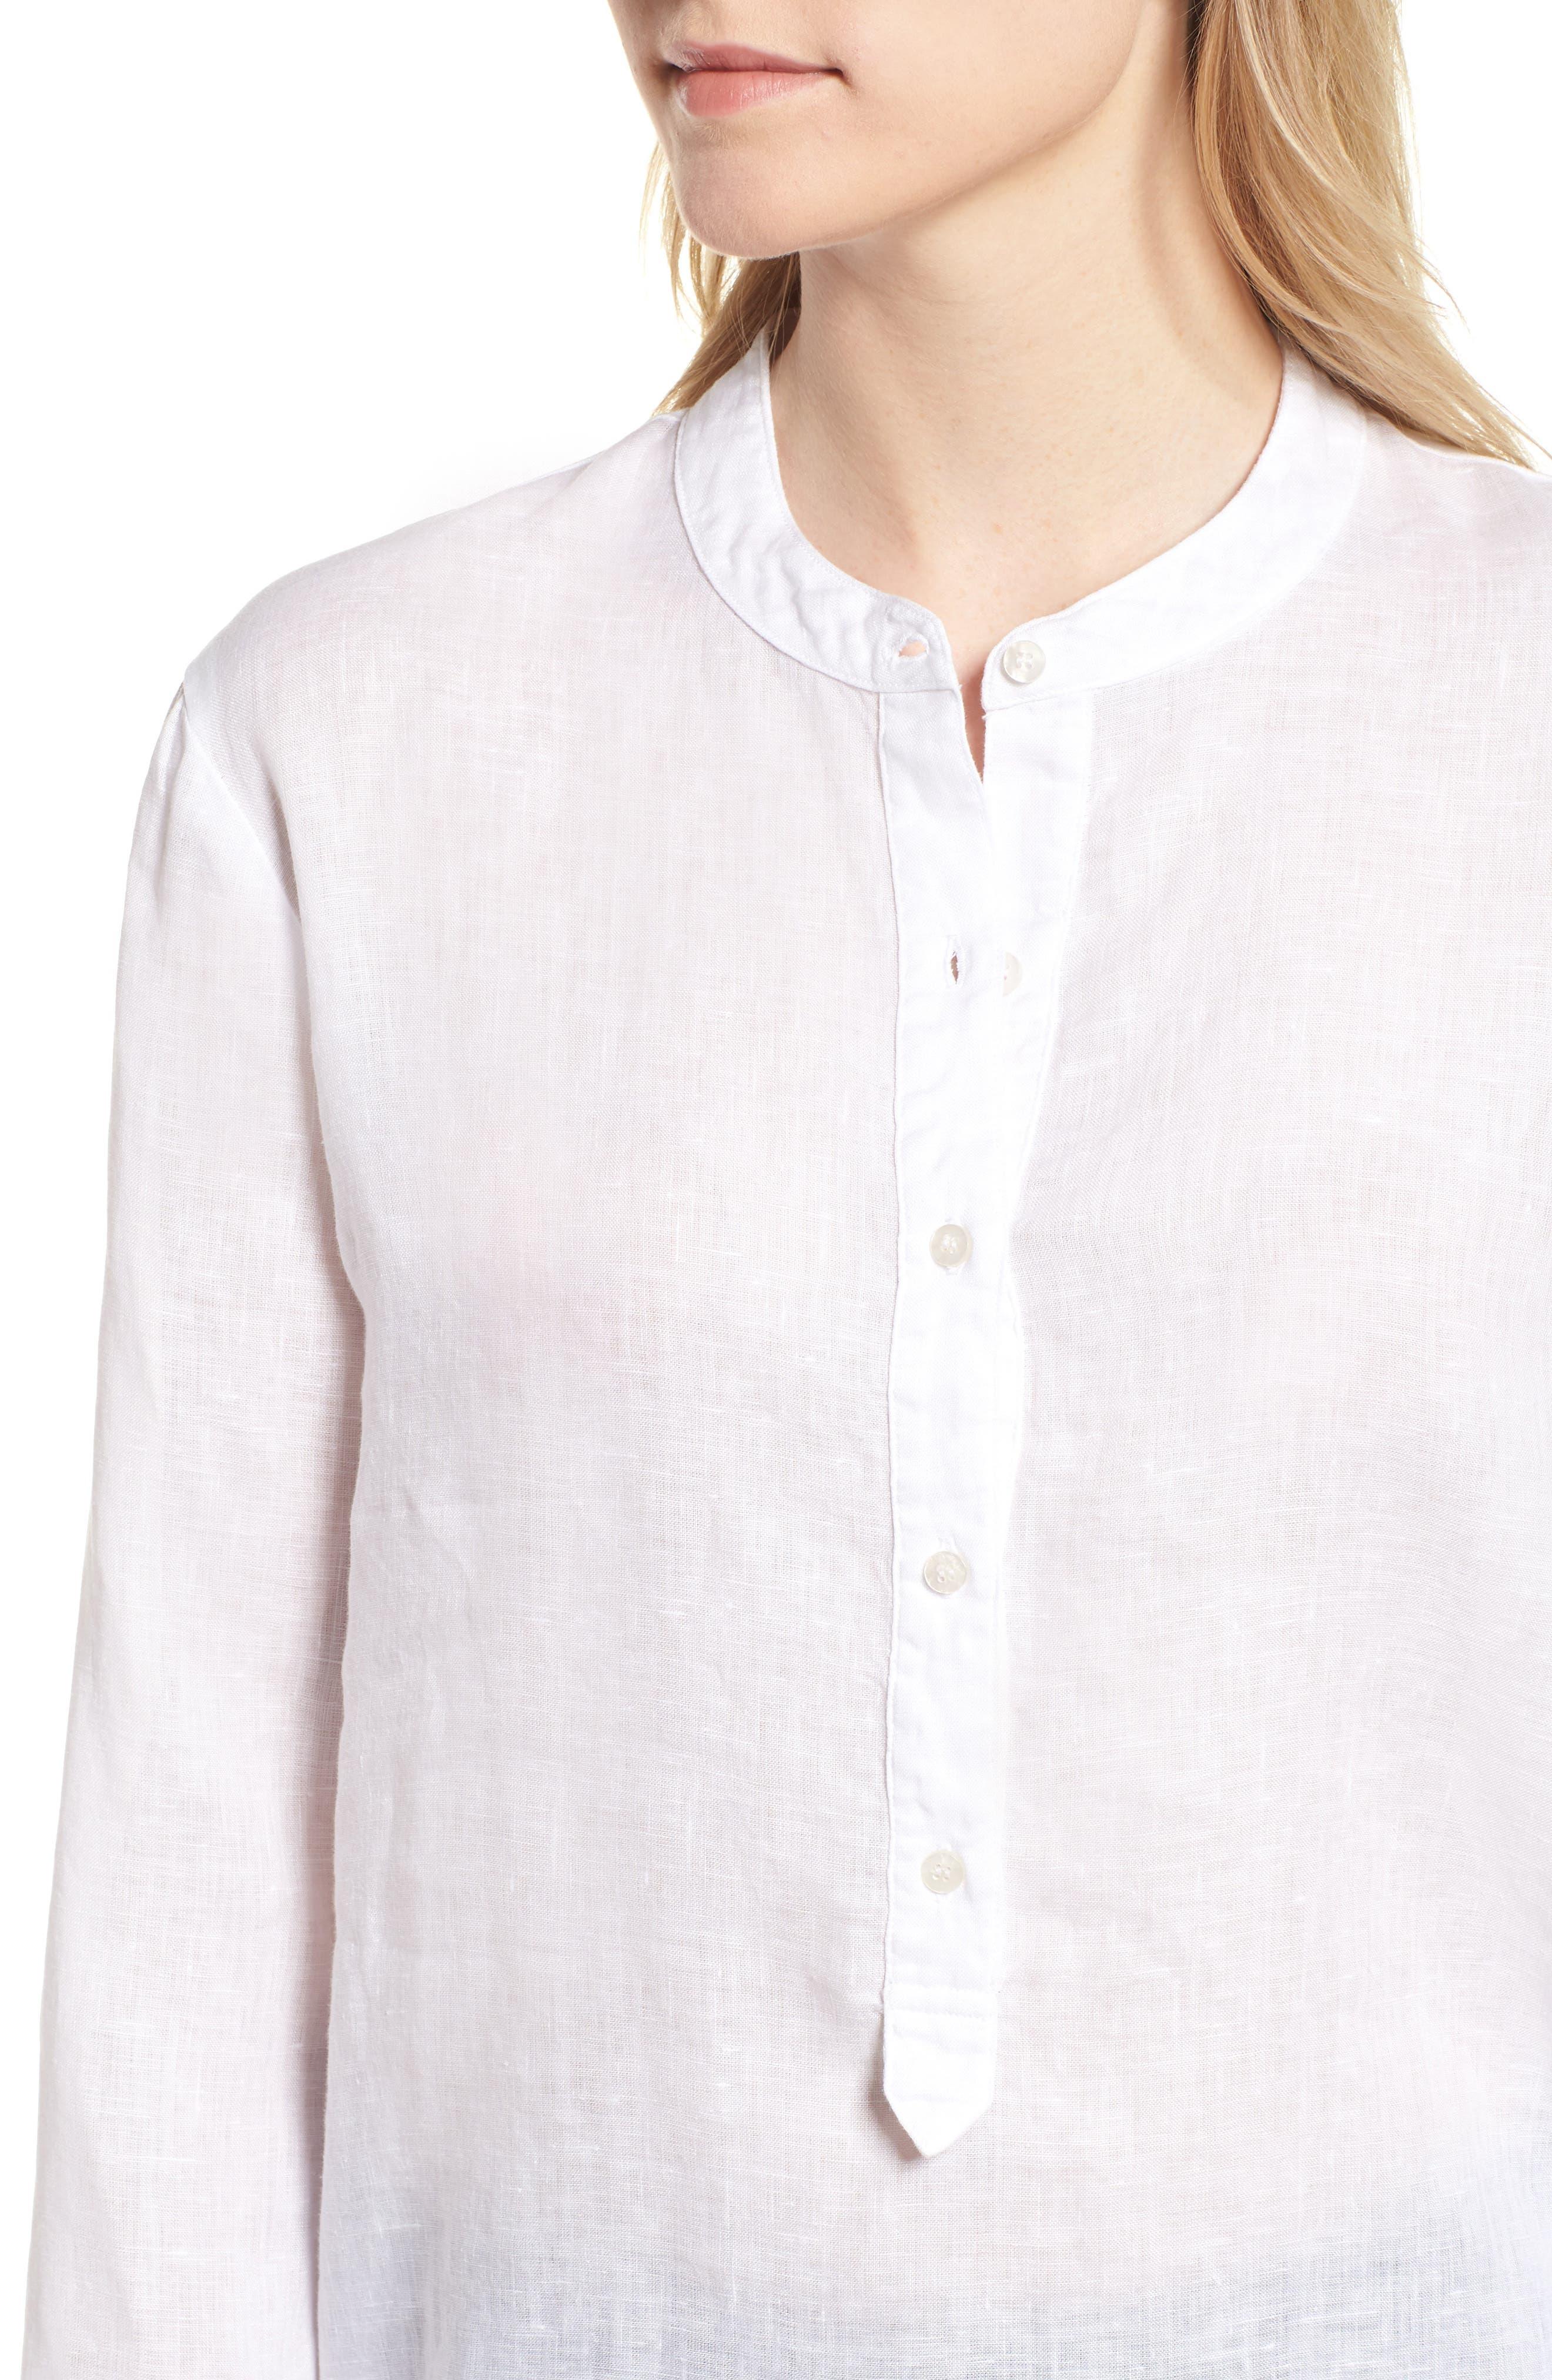 Shirting Tunic Top,                             Alternate thumbnail 4, color,                             100